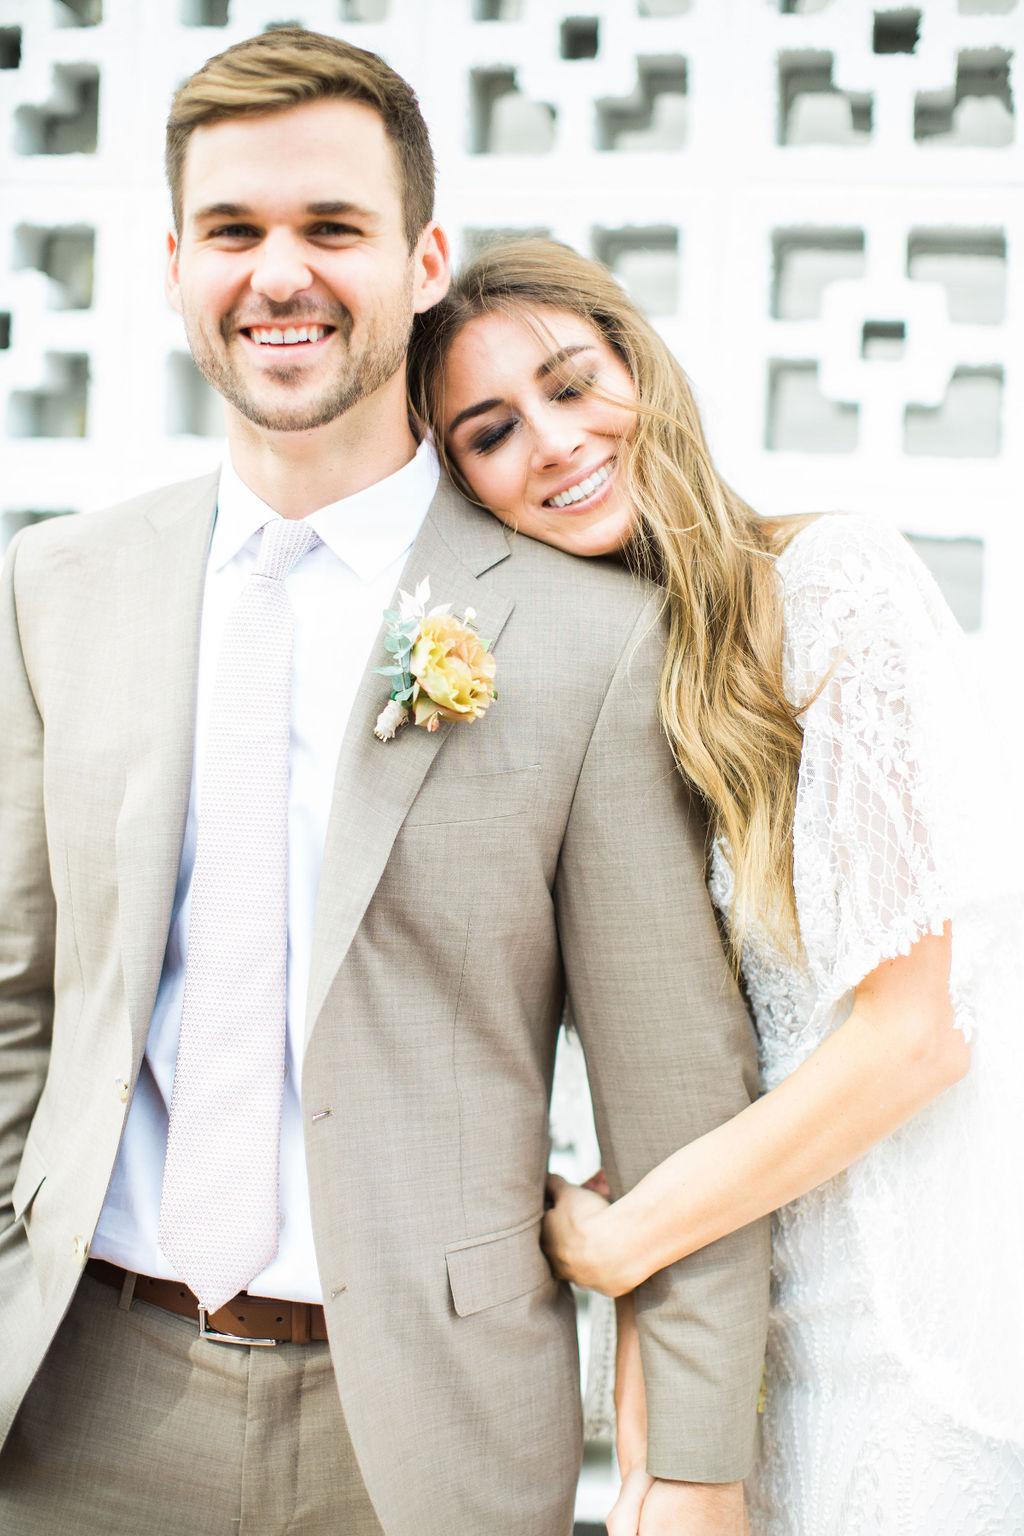 wedding couple smiling for portrait